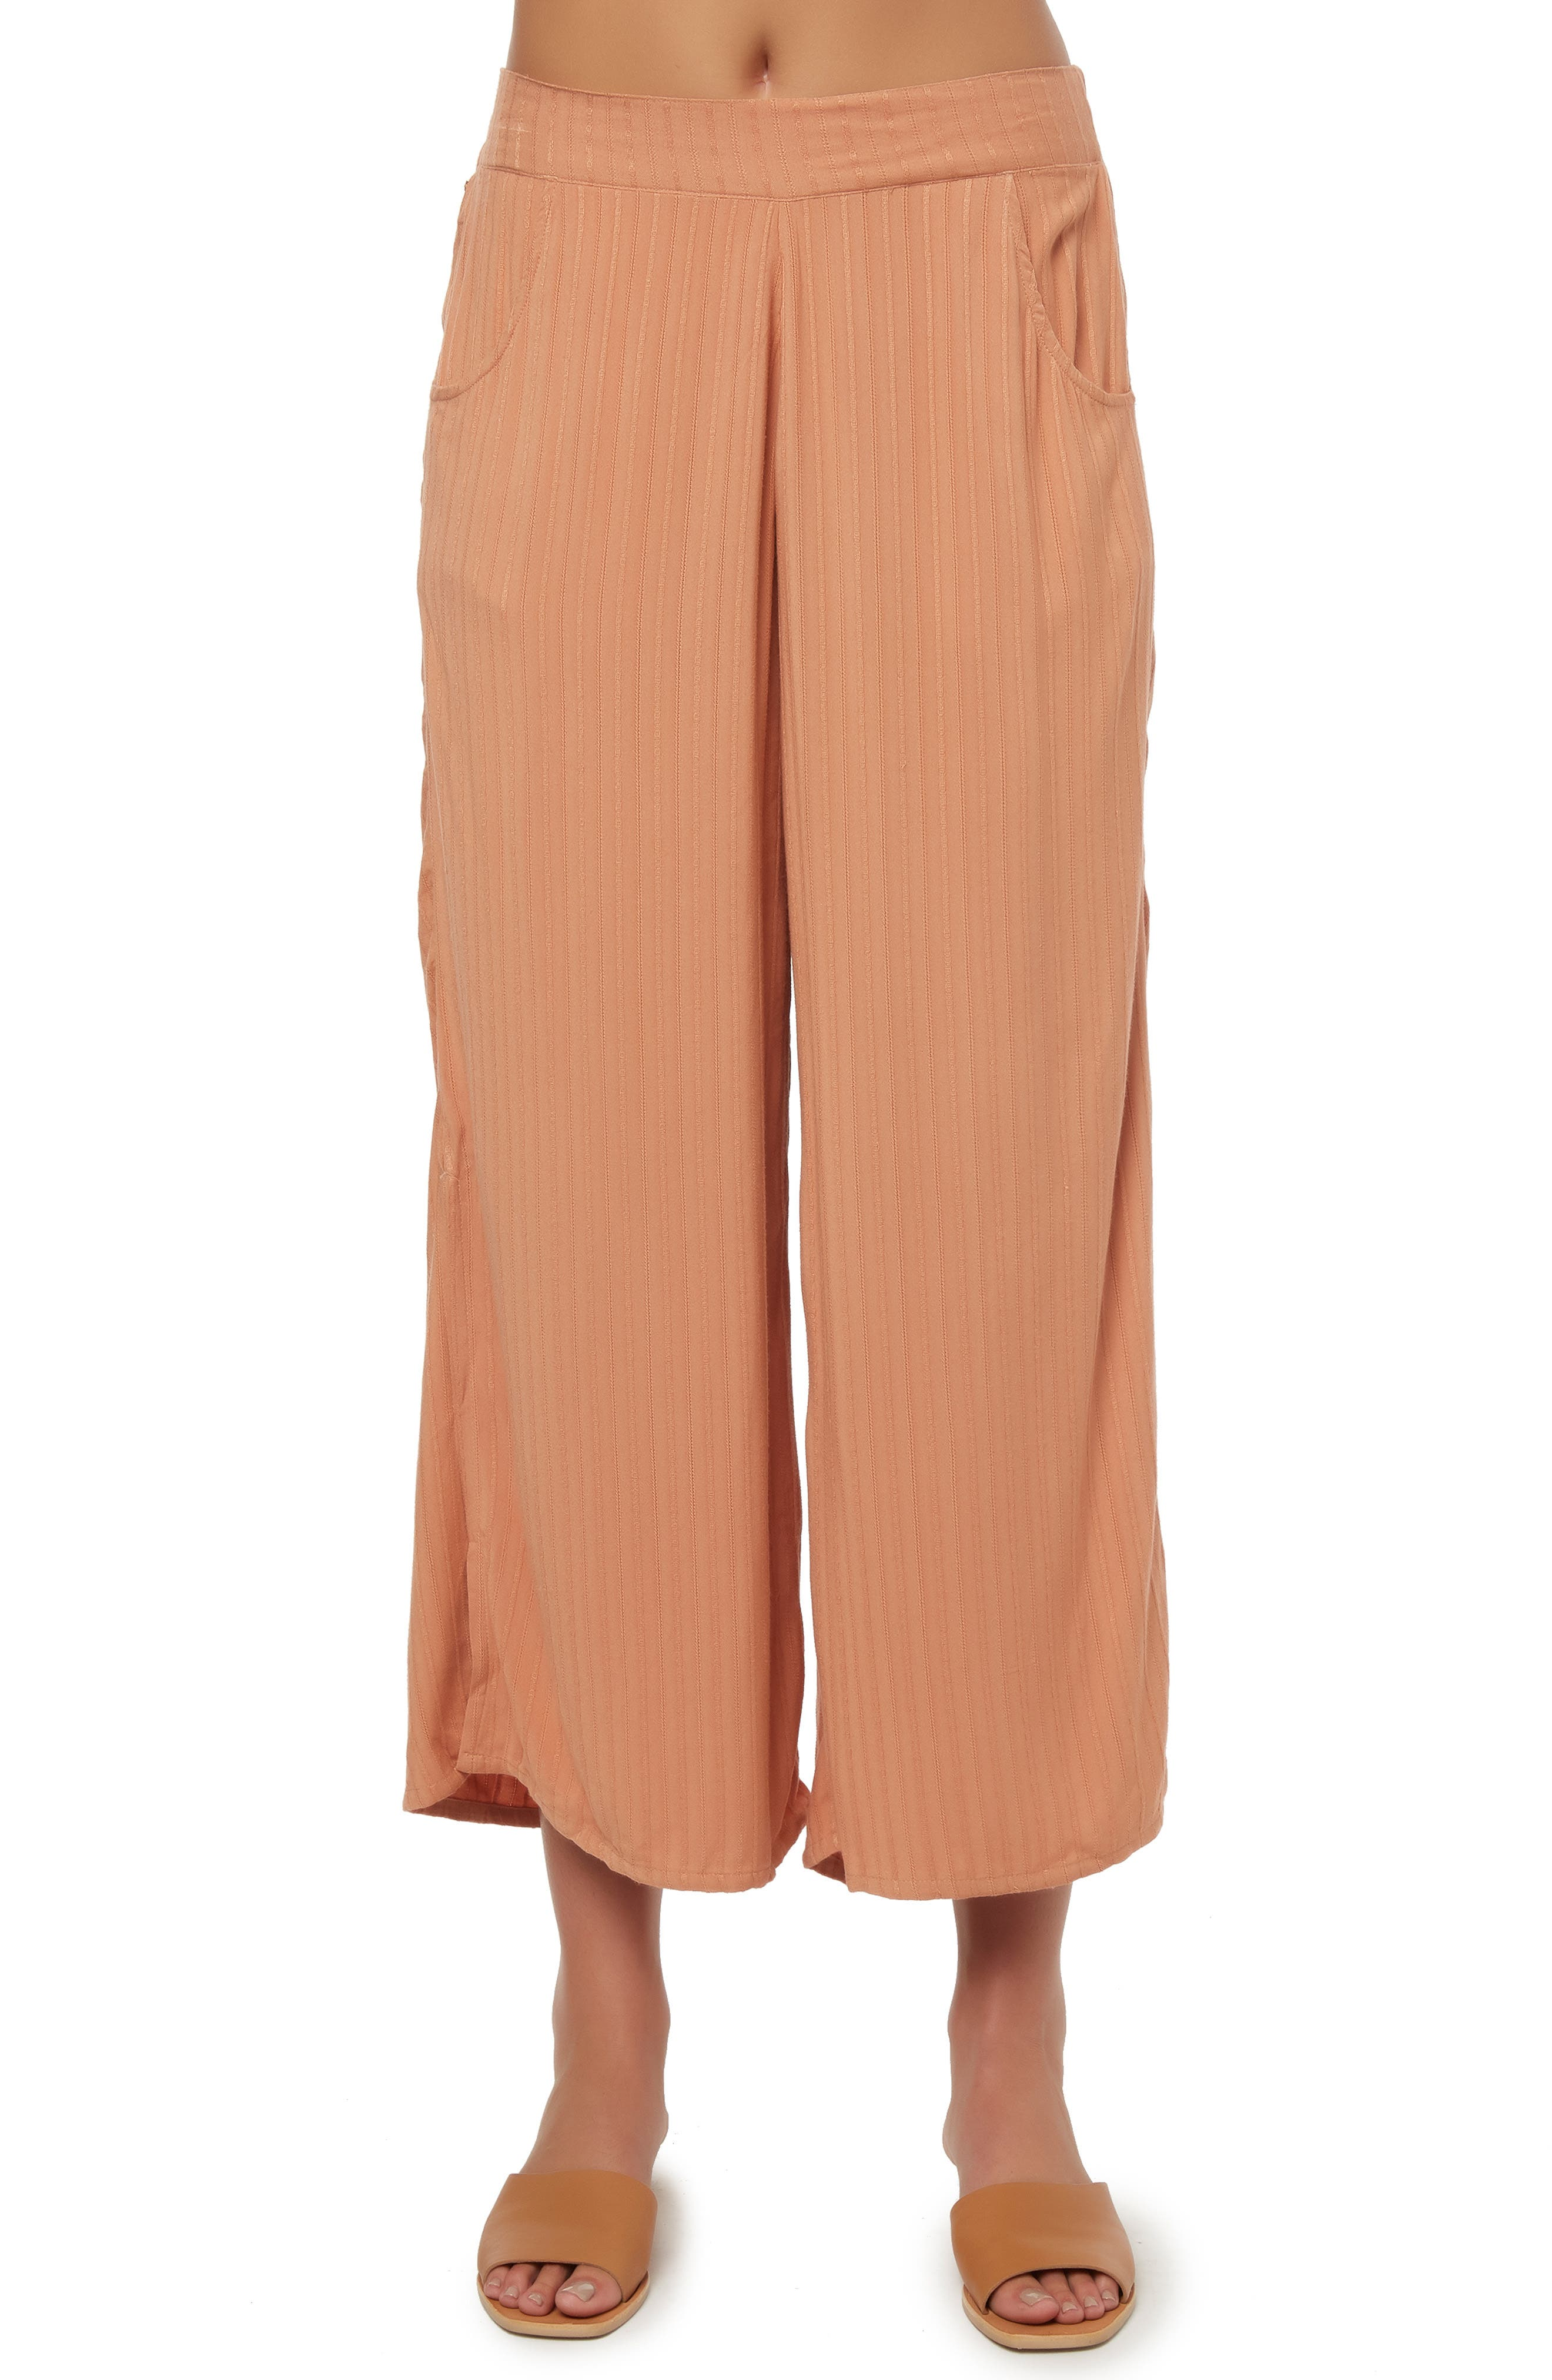 O'NEILL, Rayna Wide Leg Crop Pants, Main thumbnail 1, color, CORK